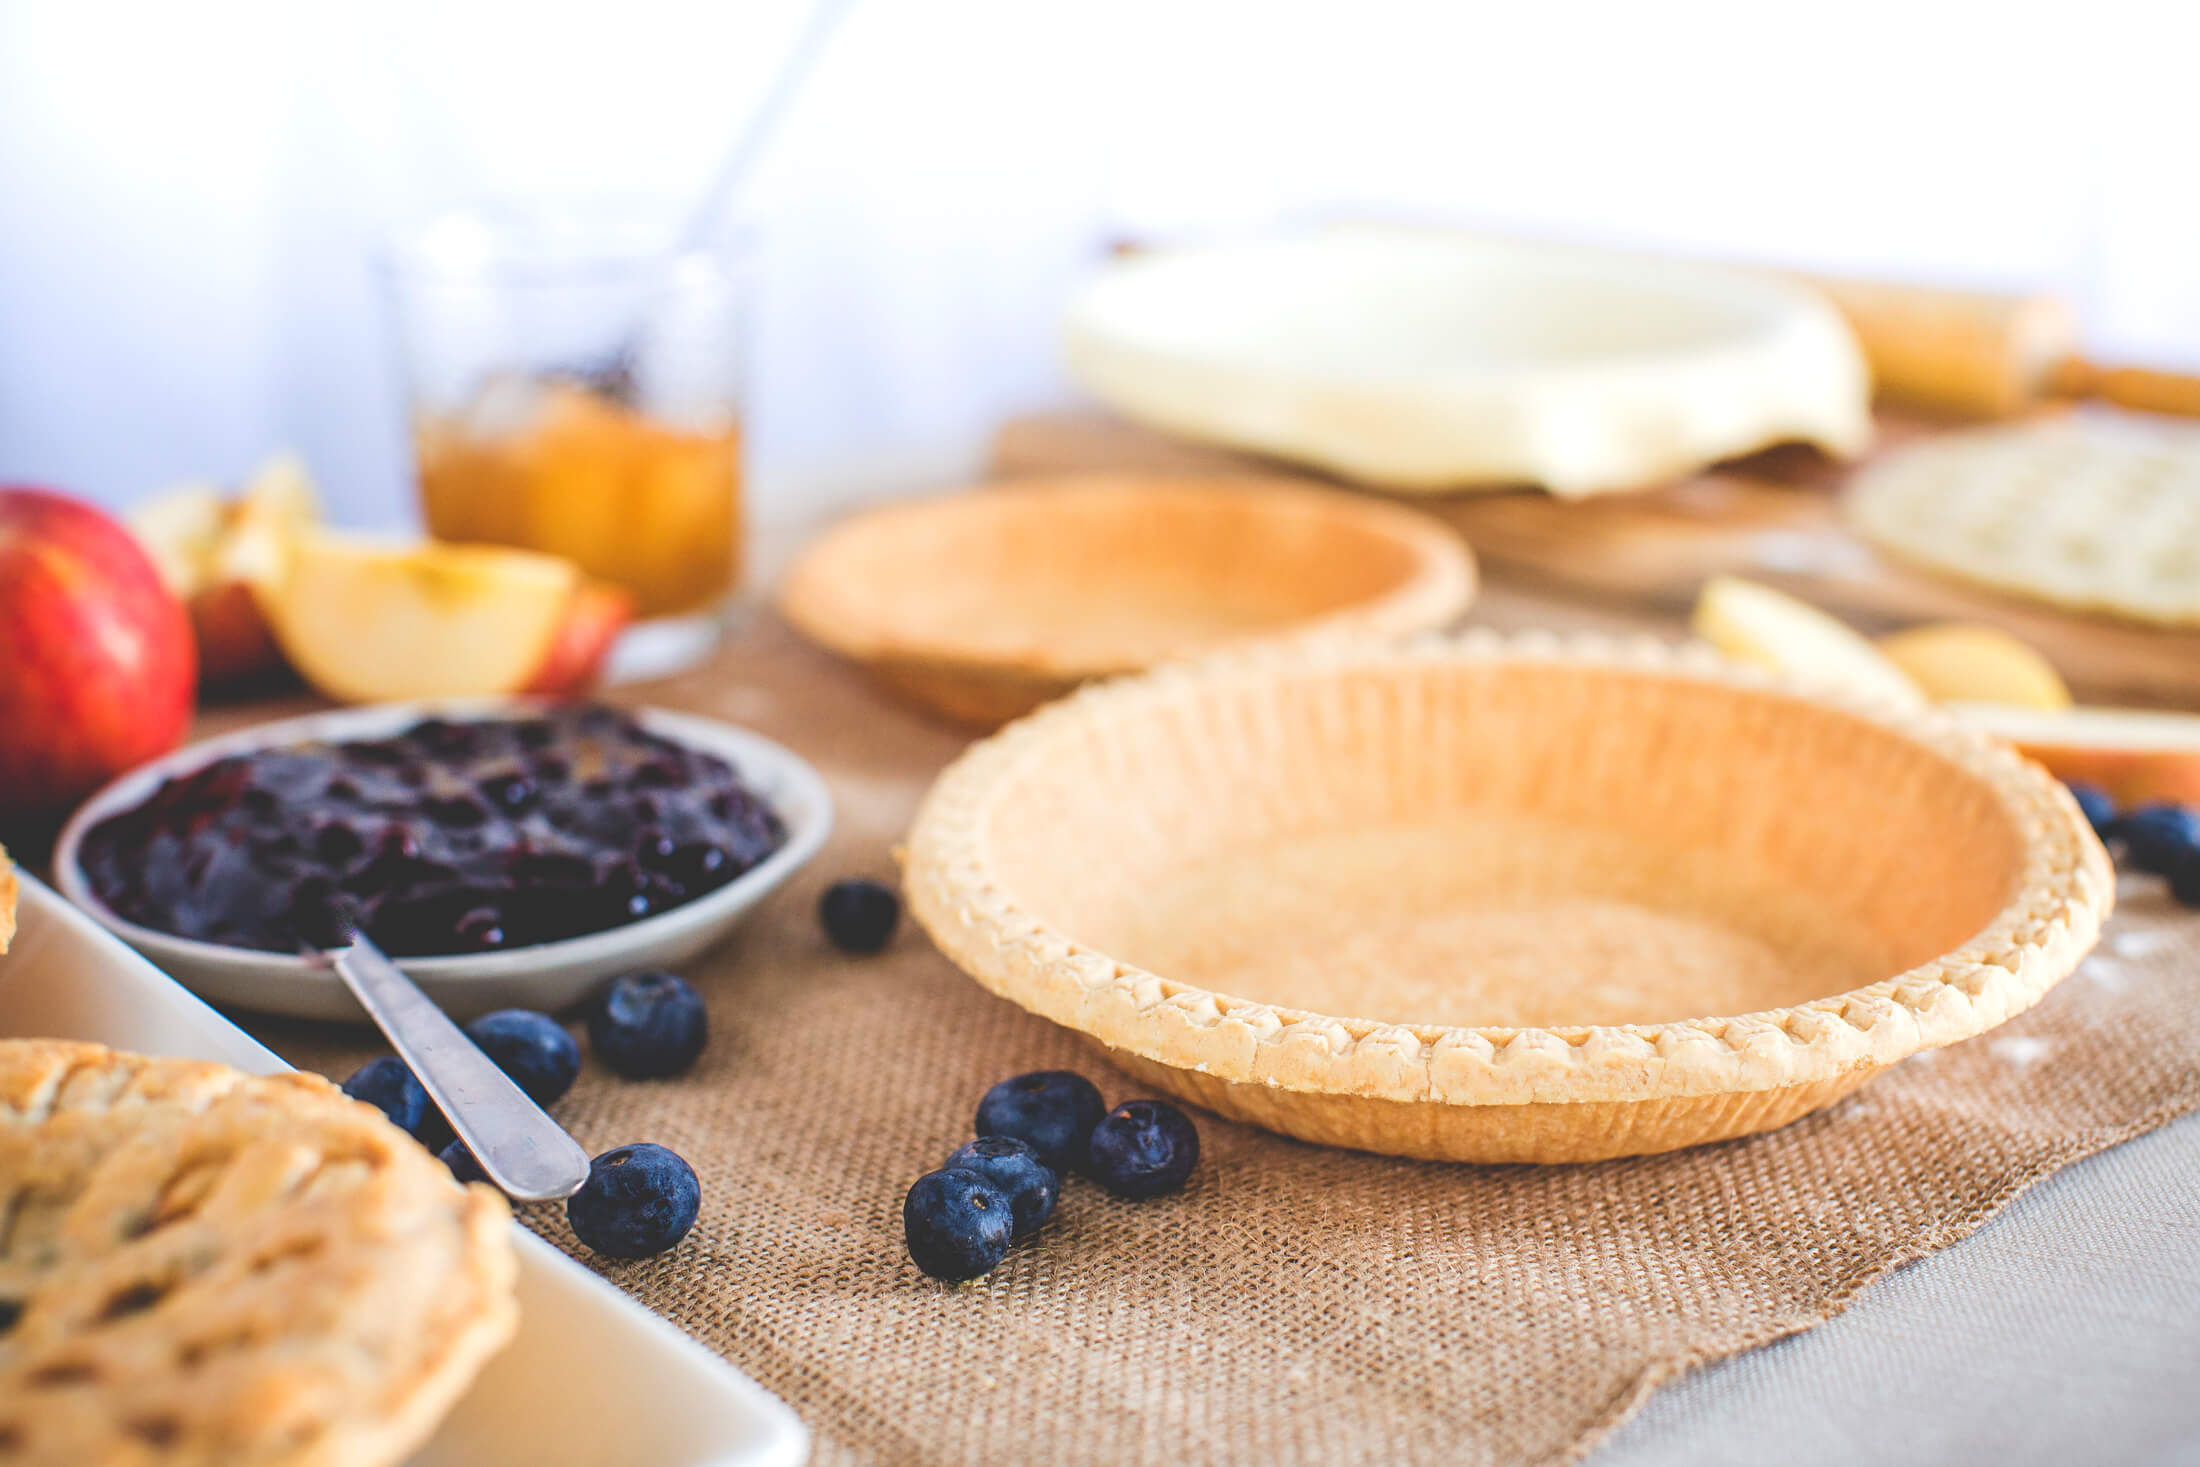 Boston Baking Pie Shells and Ingredients